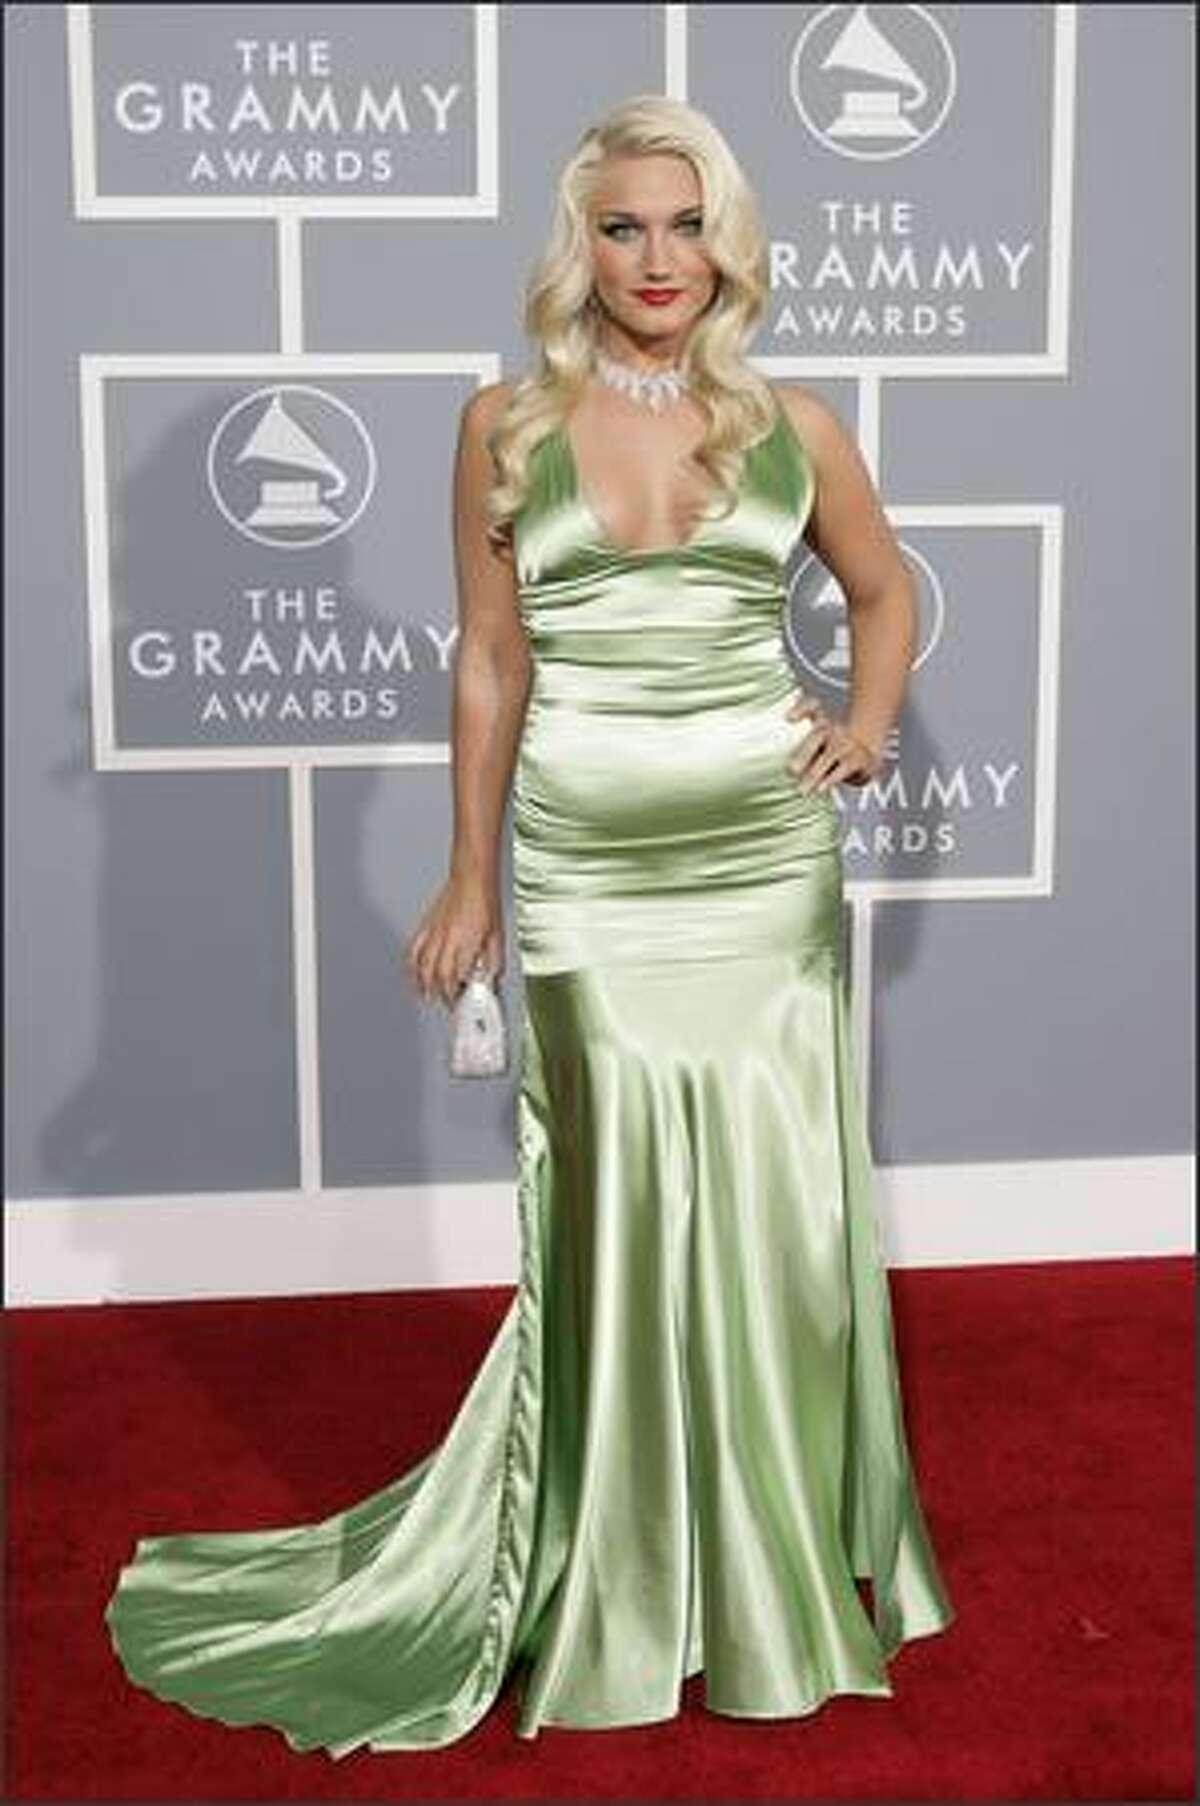 Brooke Hogan arrives for the 49th Annual Grammy Awards. (AP Photo/Matt Sayles)